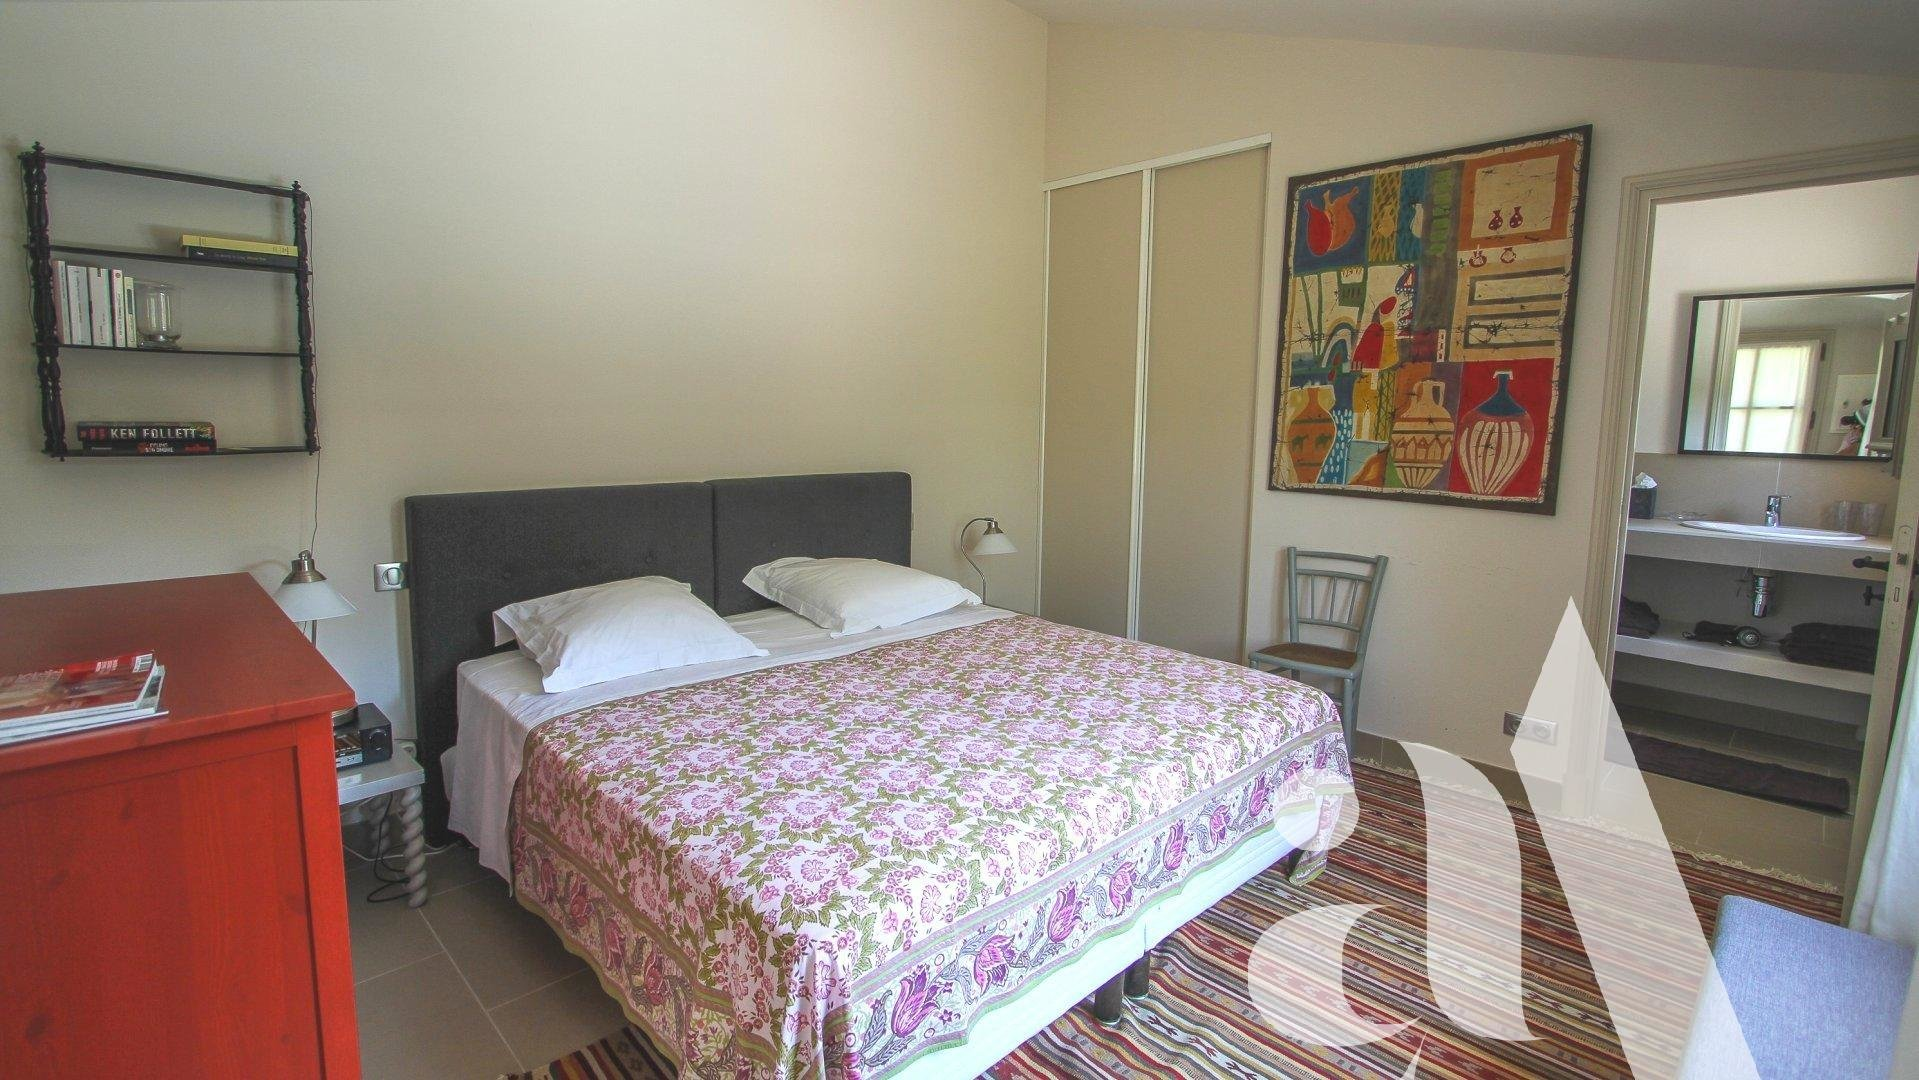 THE CACTUS MAZET - MAUSSANE - ALPILLES - 4 Rooms - 8 people